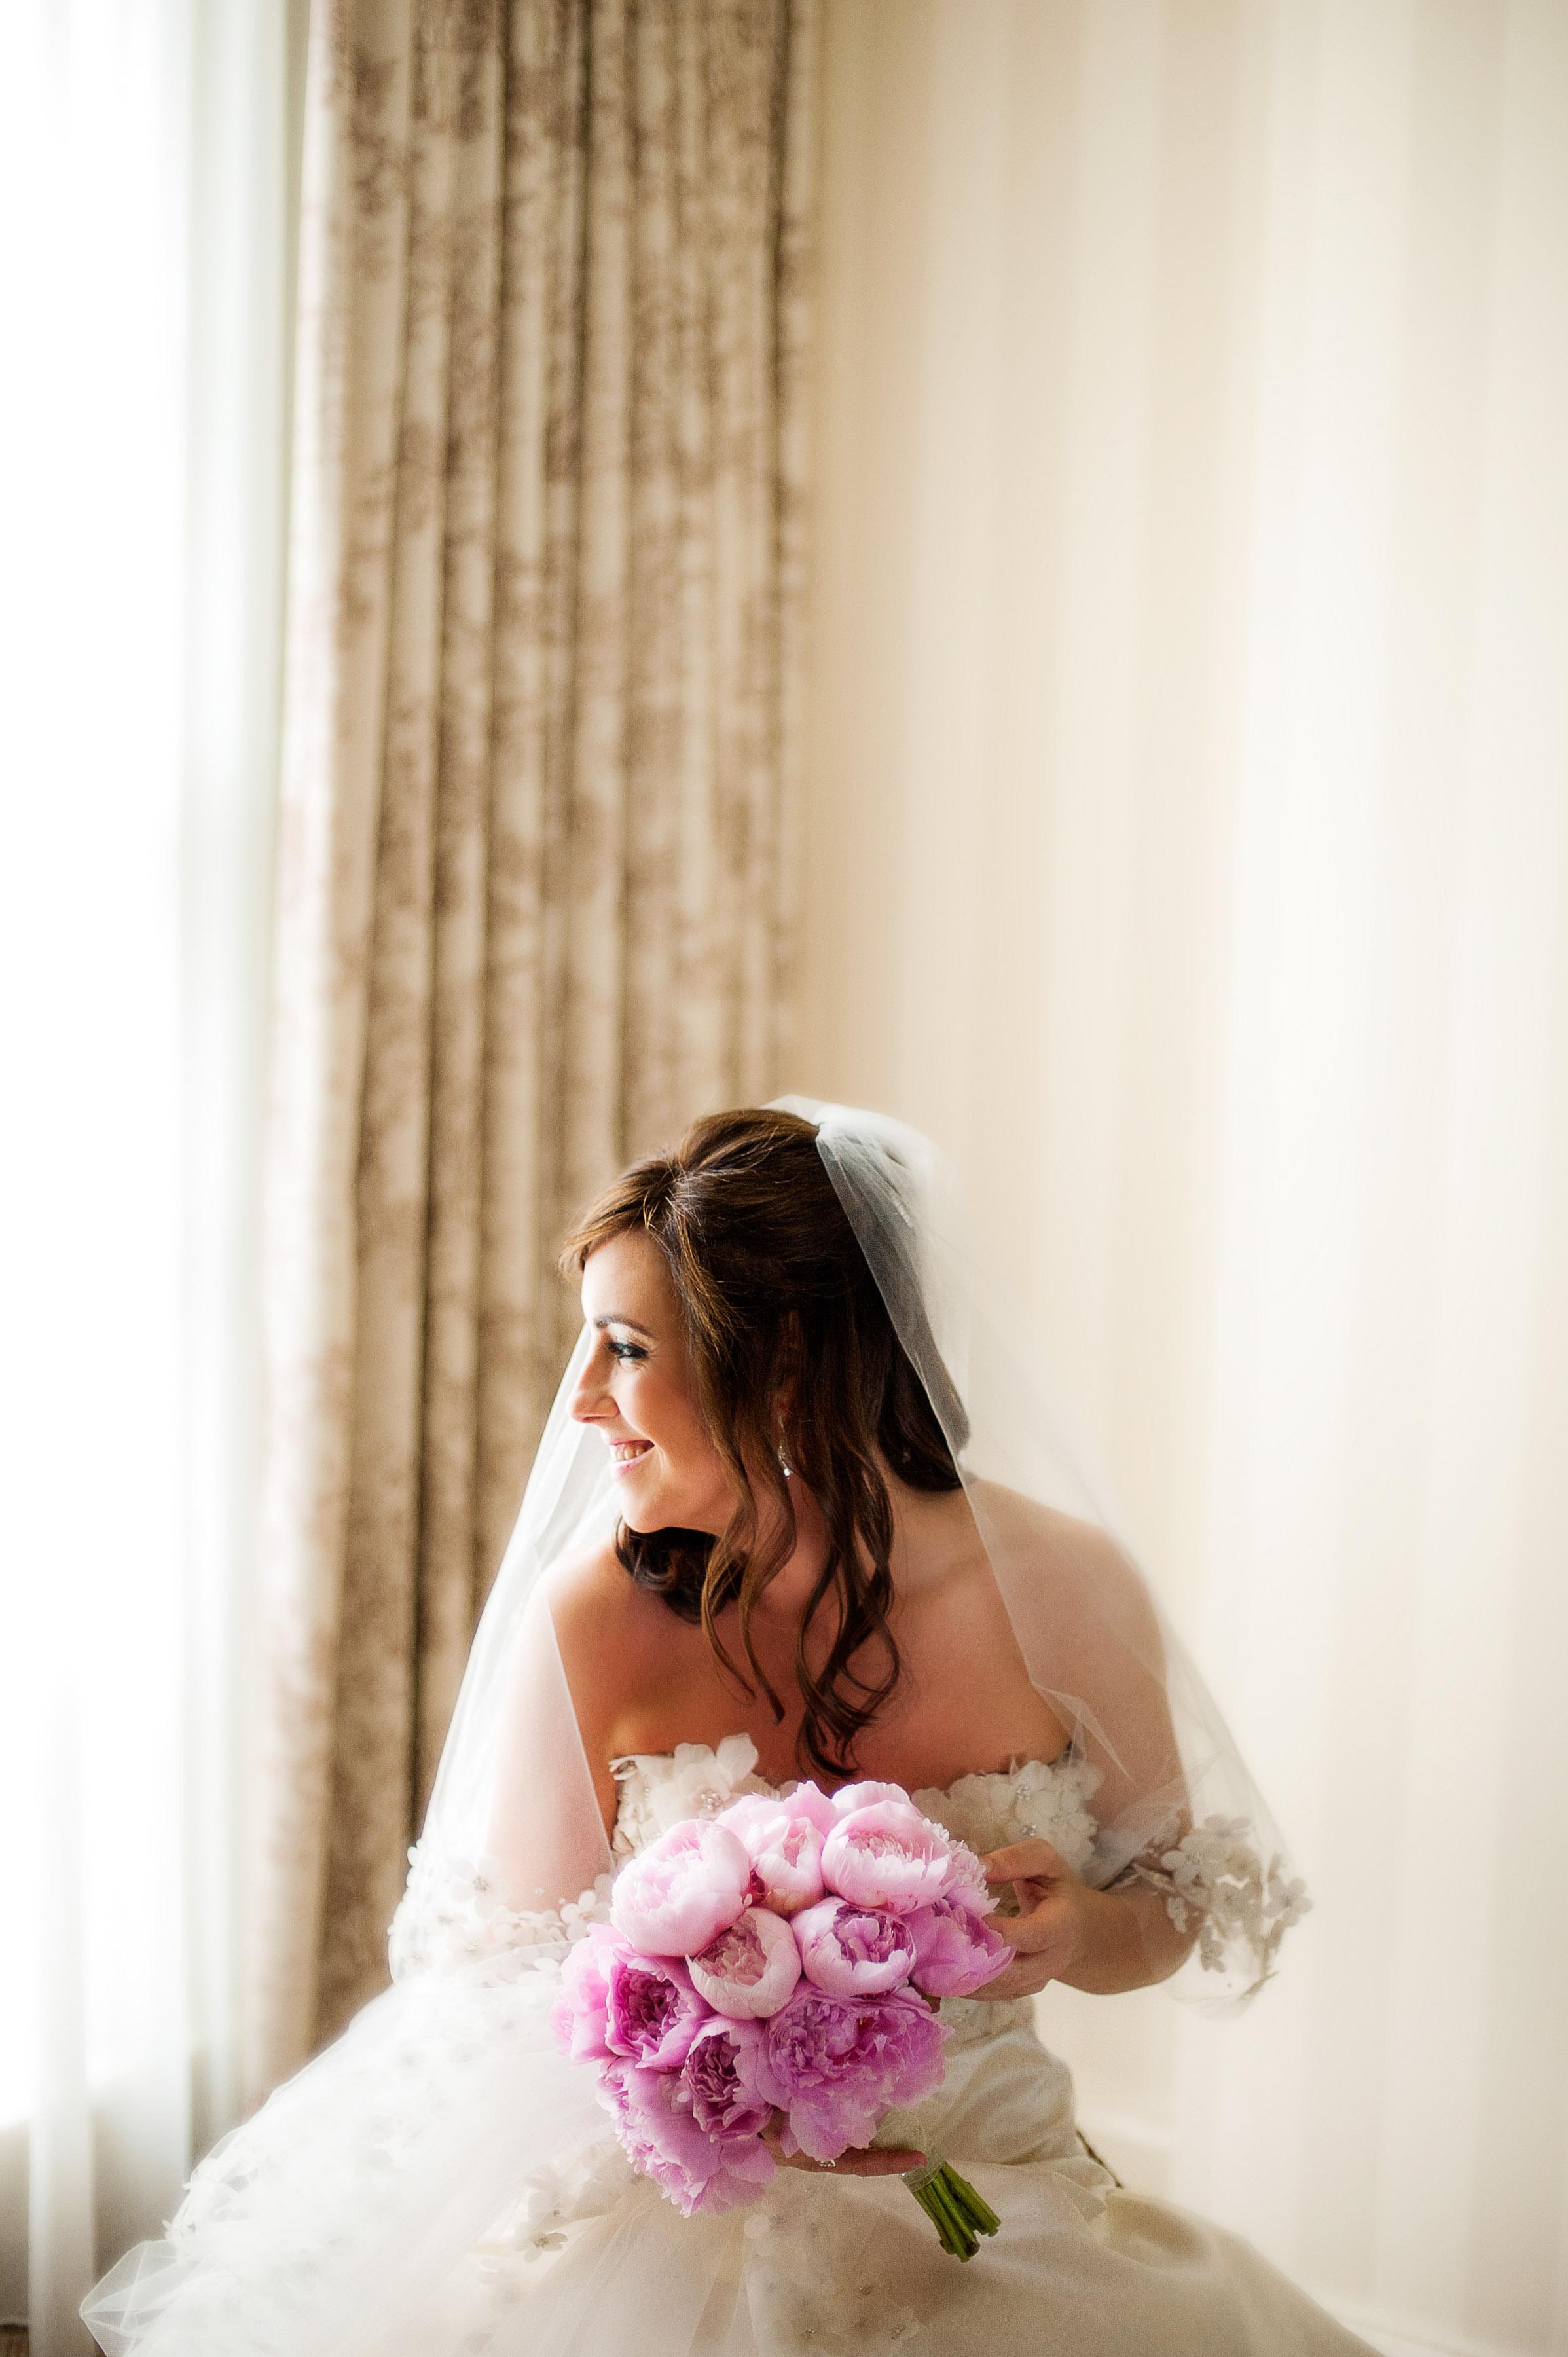 pink, Bride, Bouquet, Elizabeth andrew